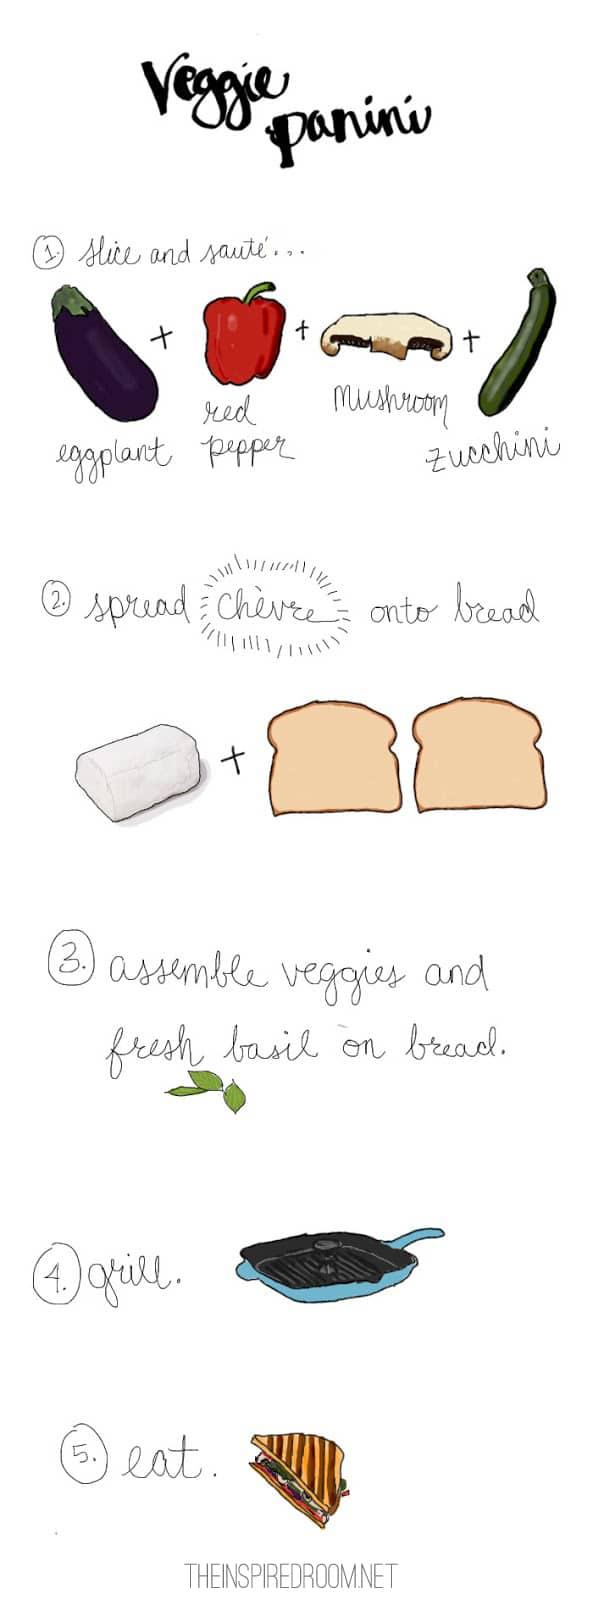 Veggie Panini Recipe